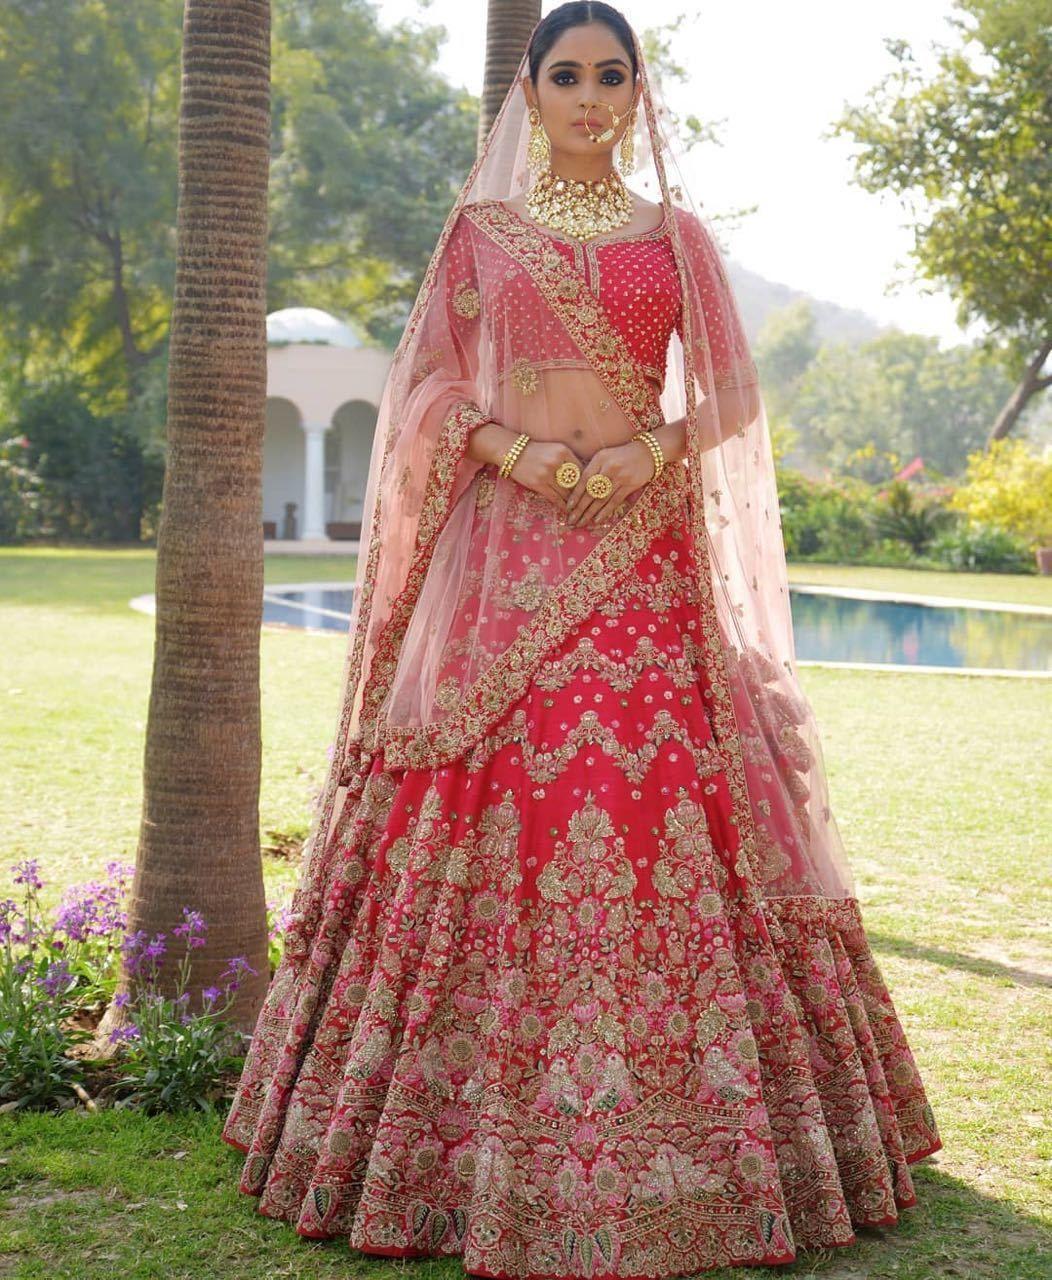 bef20b343 INDIAN BRIDAL TRADITIONAL CULTURAL WEDDING RED XXL BANARASI SILK LEHENGA  CHOLI